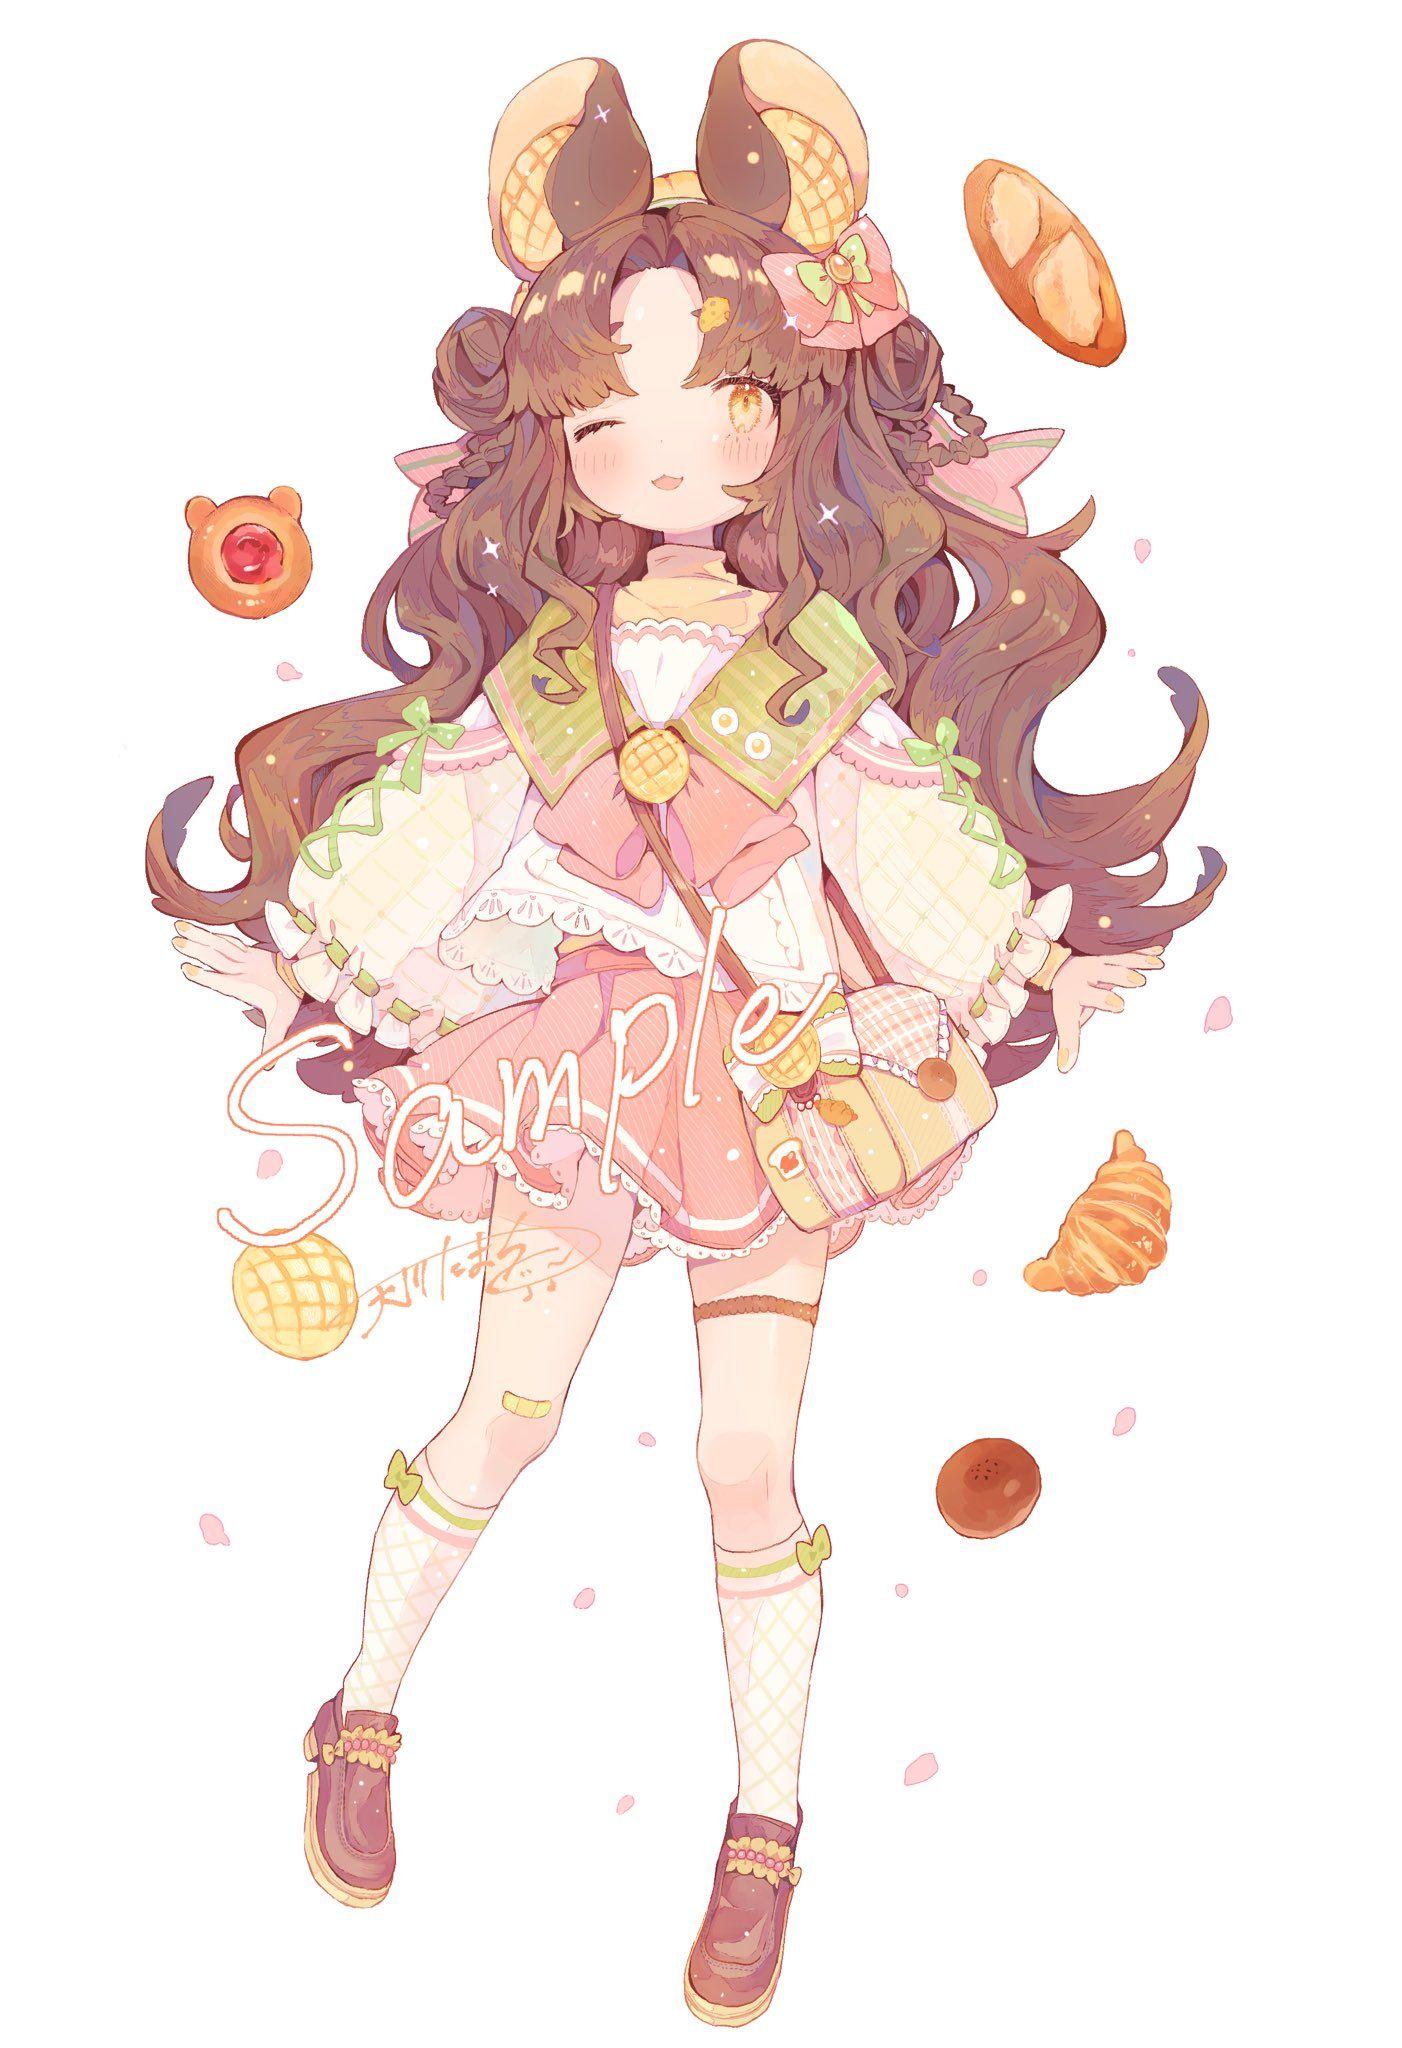 Anime by Xuânˆˆ on Beautiful fanart Anime ⚈ ̫ ⚈ in 2020